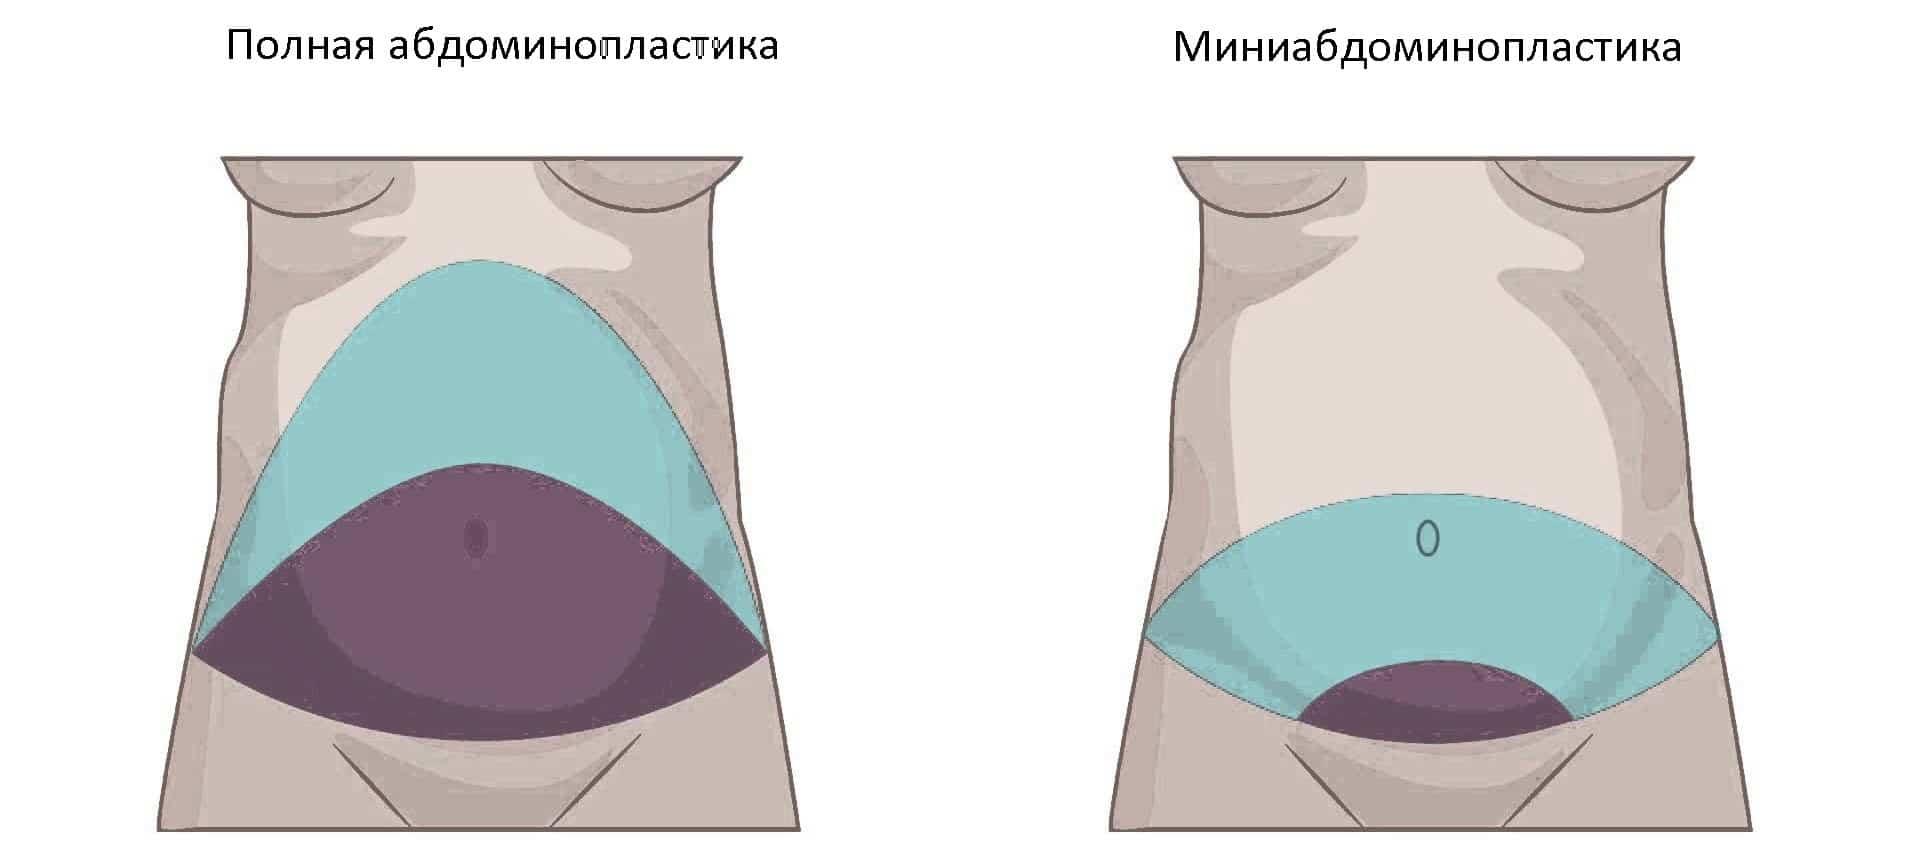 Abdominoplastika 1